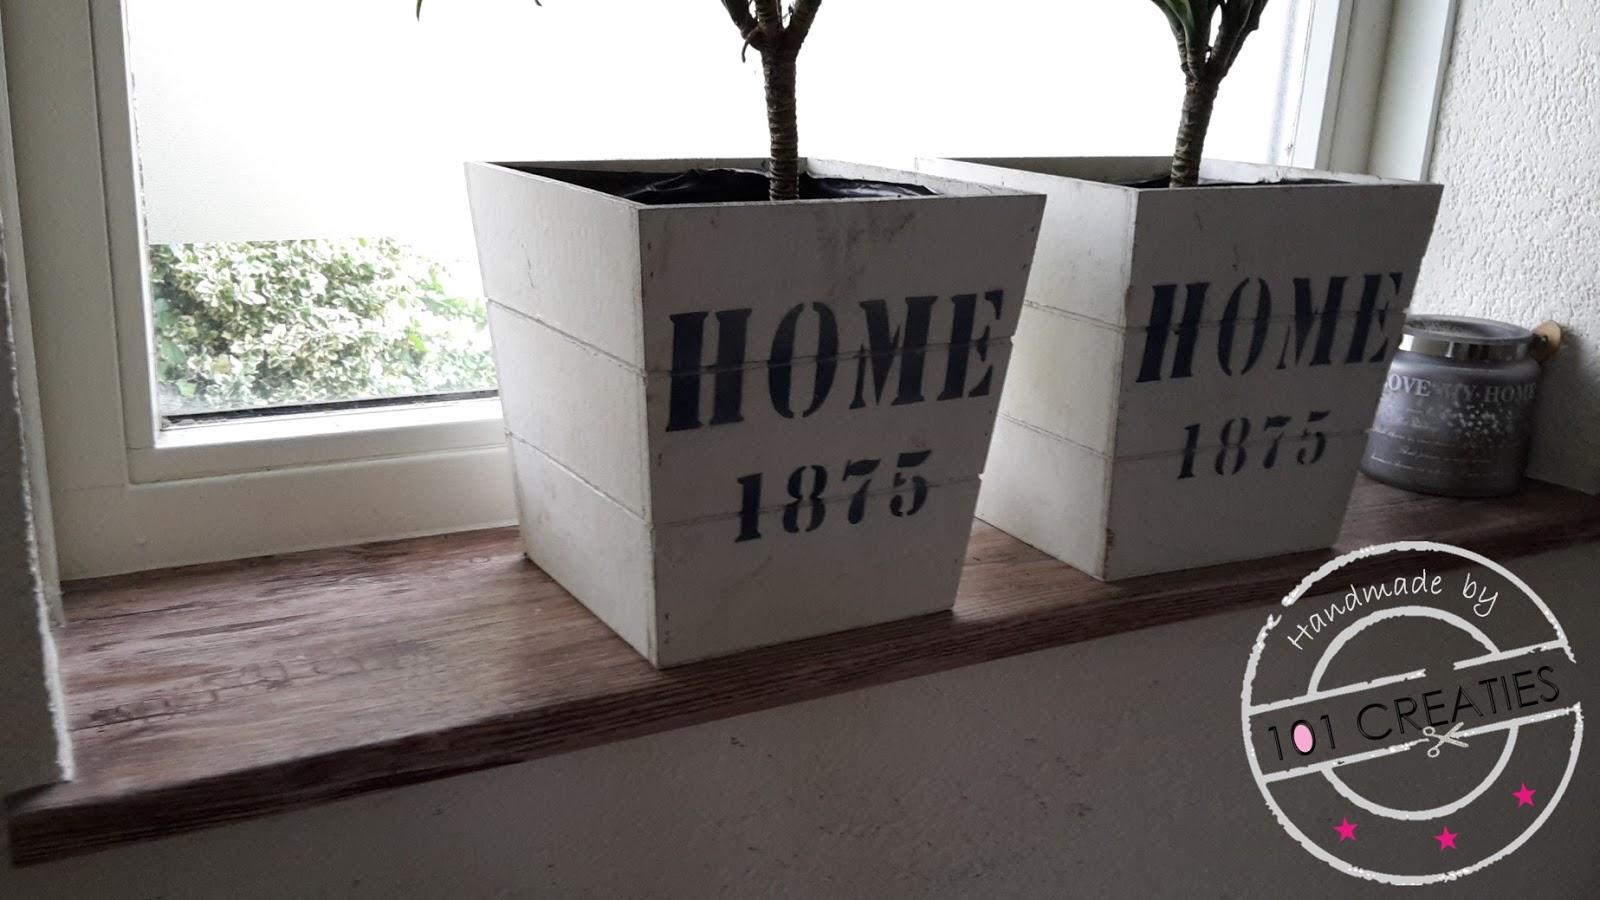 Keuken Pimpen Verzameling : Vensterbank pimpen gelakt hout verven zonder schuren